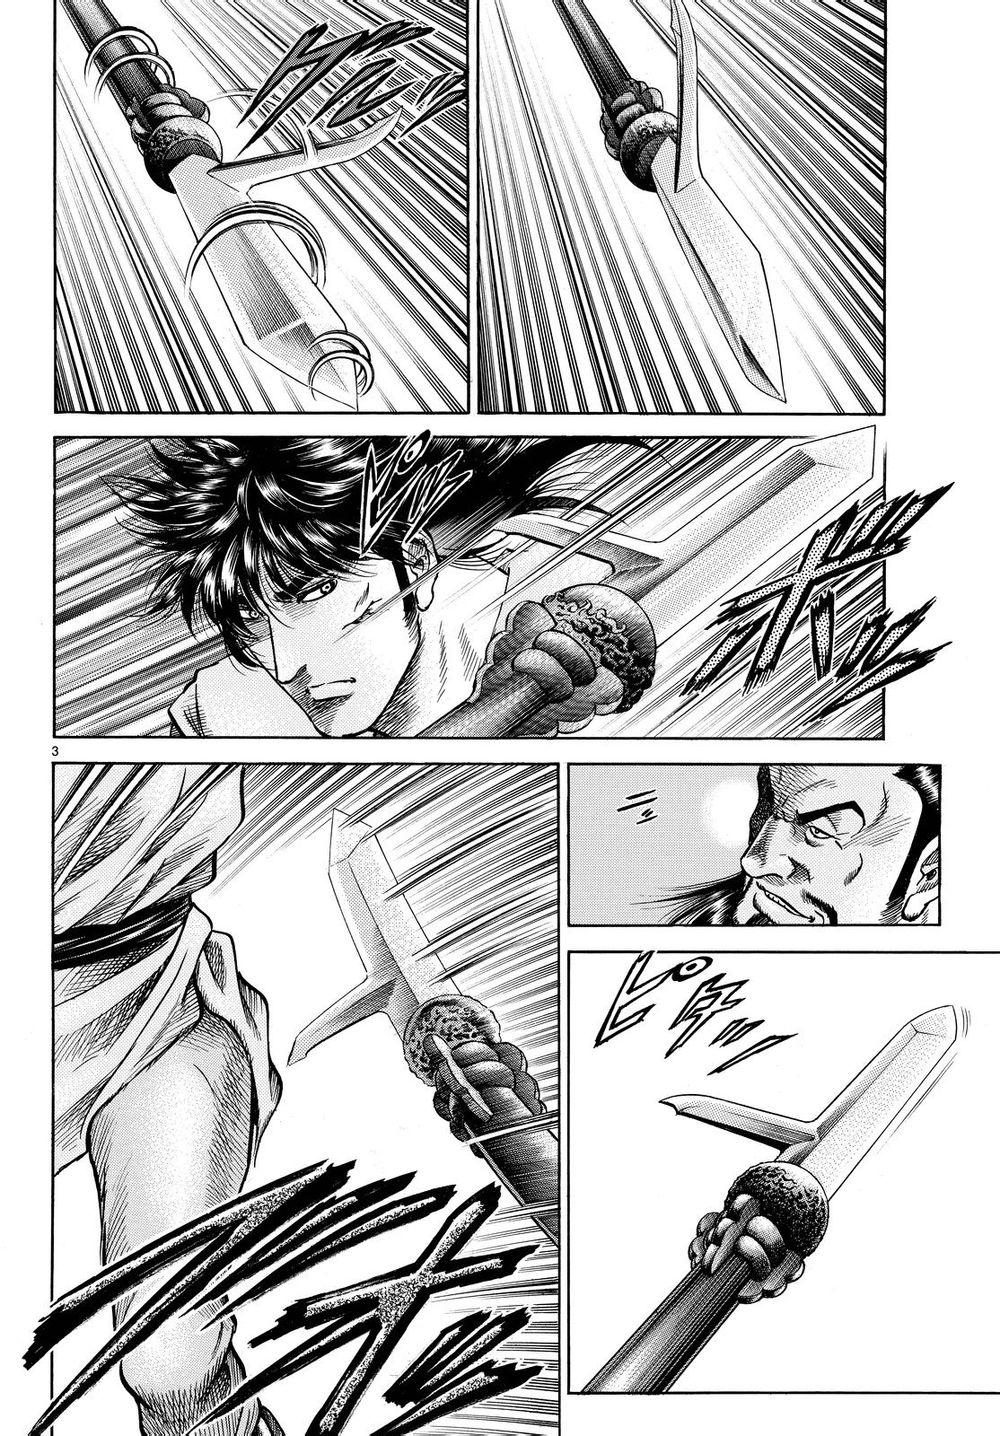 Ryuuroden-Chú bé rồng Chap 258 - Next Chap 259 image 3